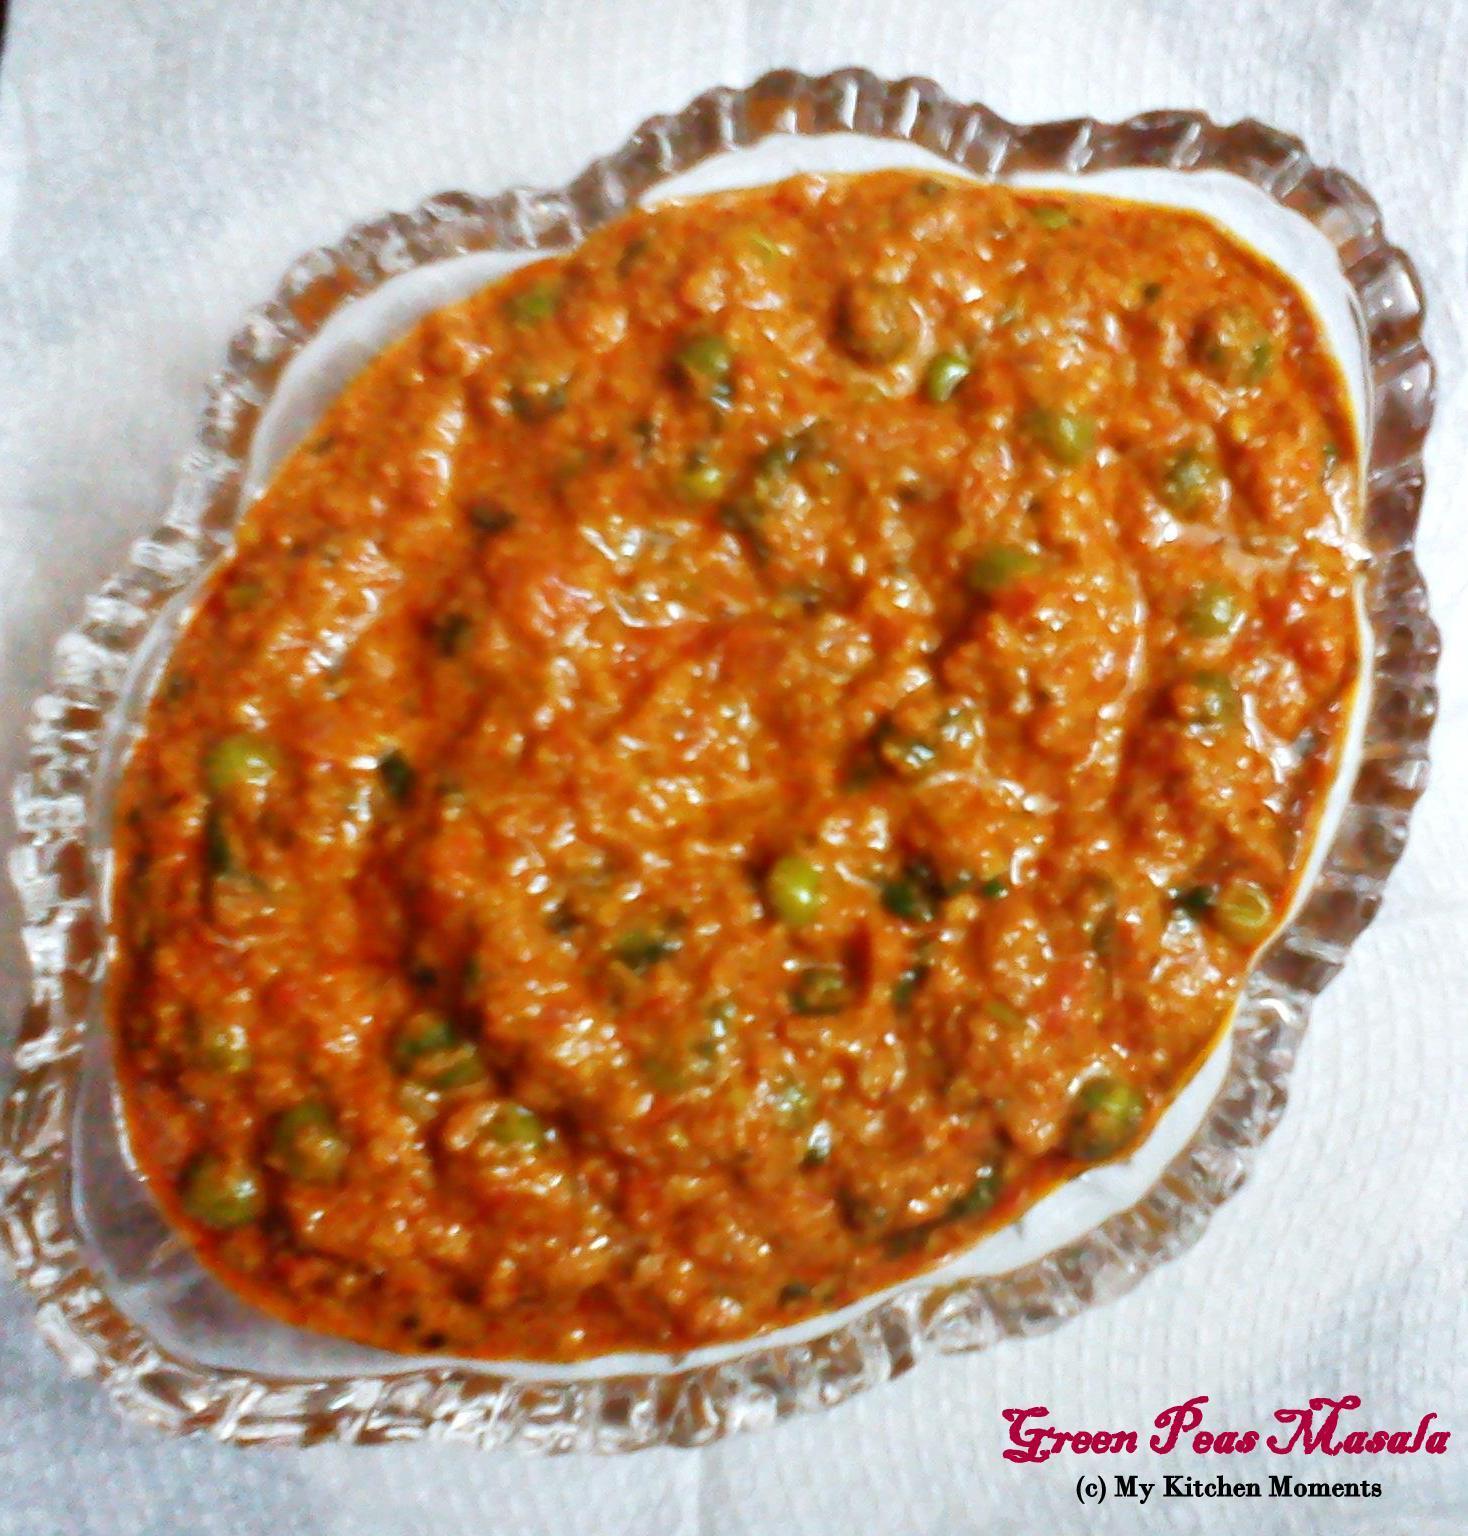 Green Peas Masala – Restaurant Style Peas Masala